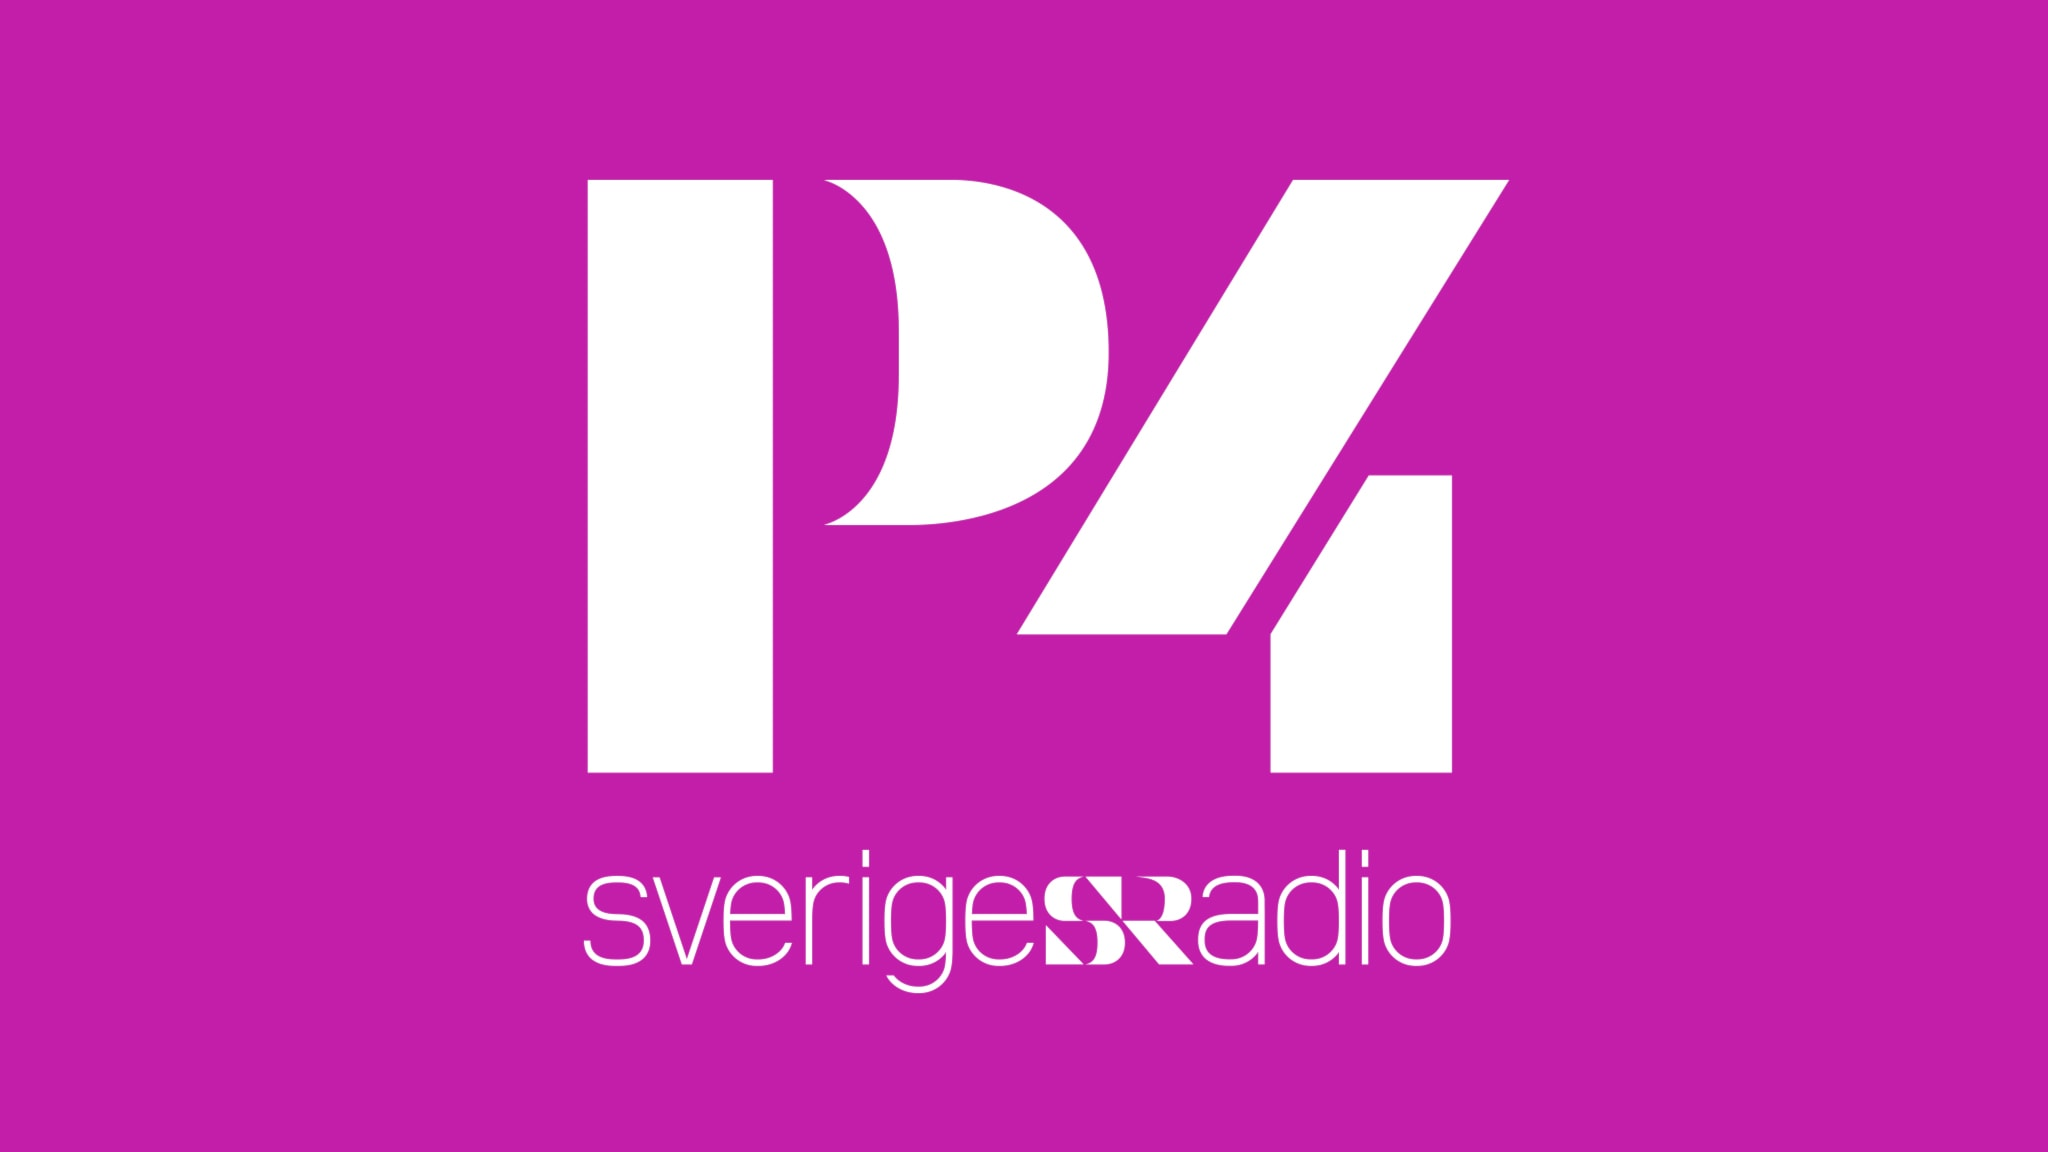 Trafik P4 Stockholm 20180422 15.39 (01.14)